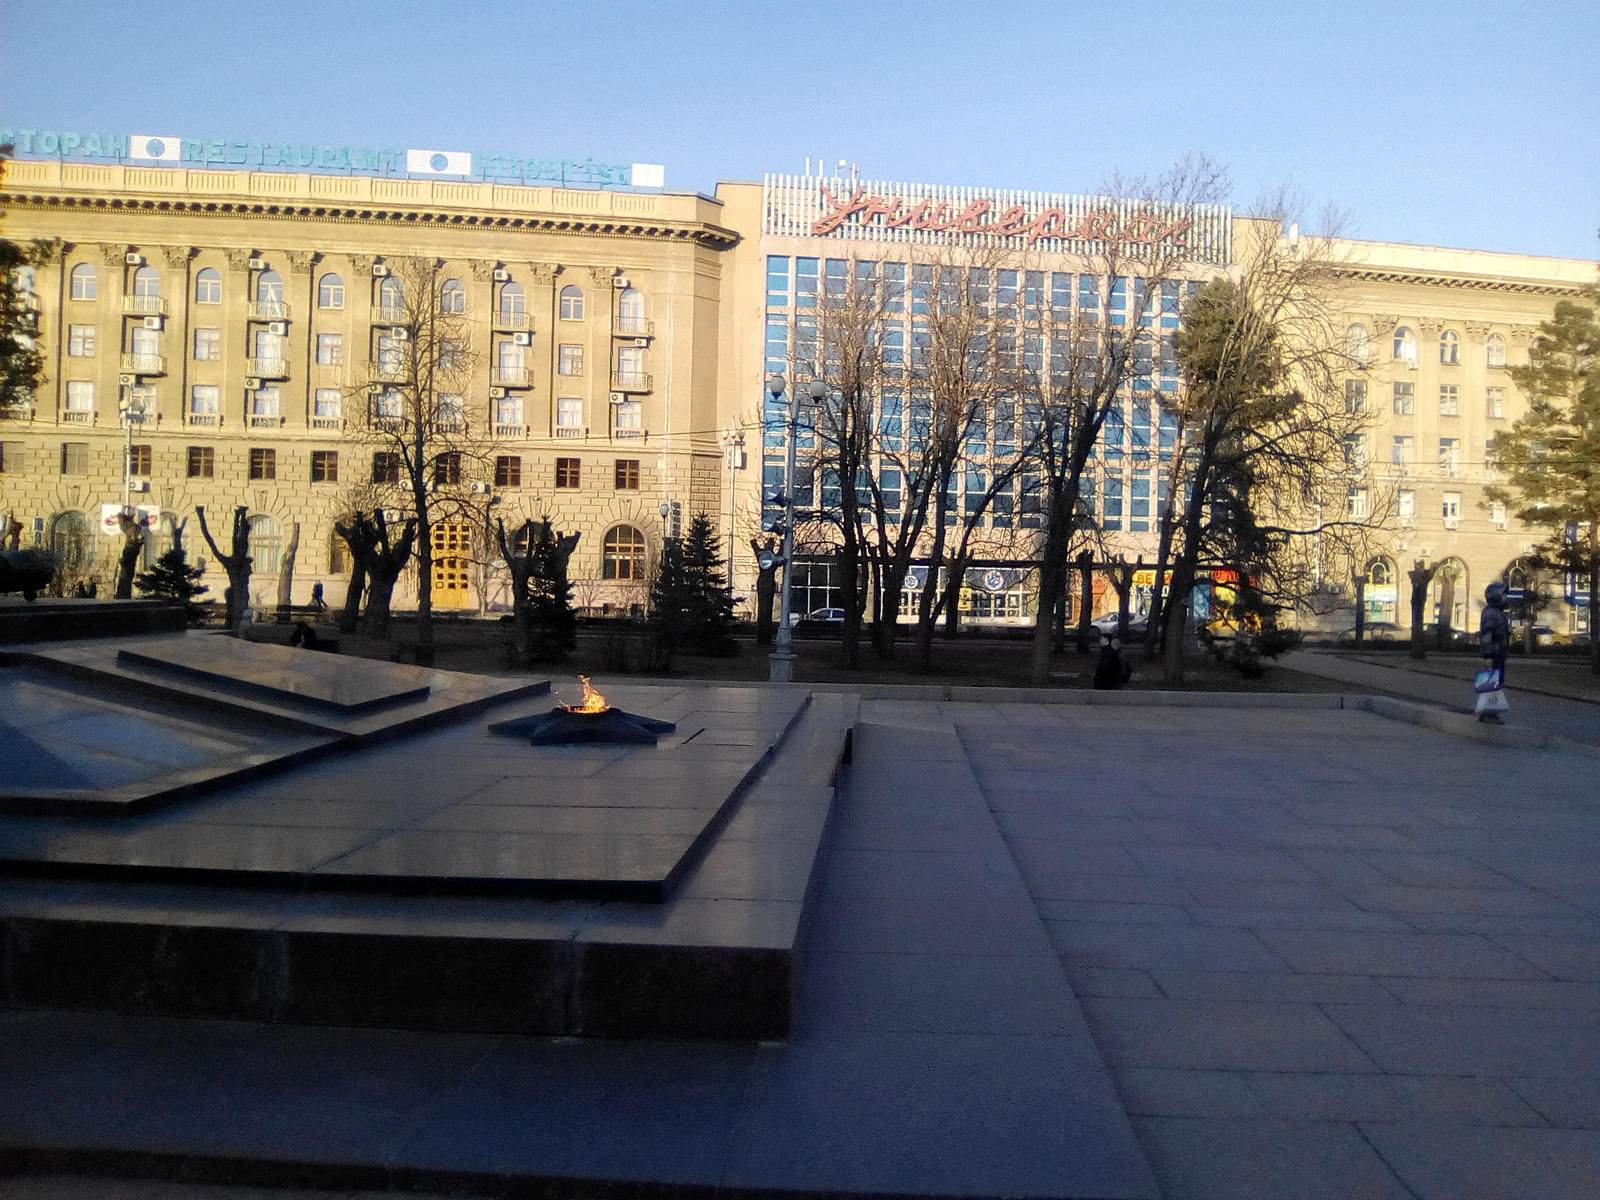 Volgograd. Department store by Not-Sleeping-Owl